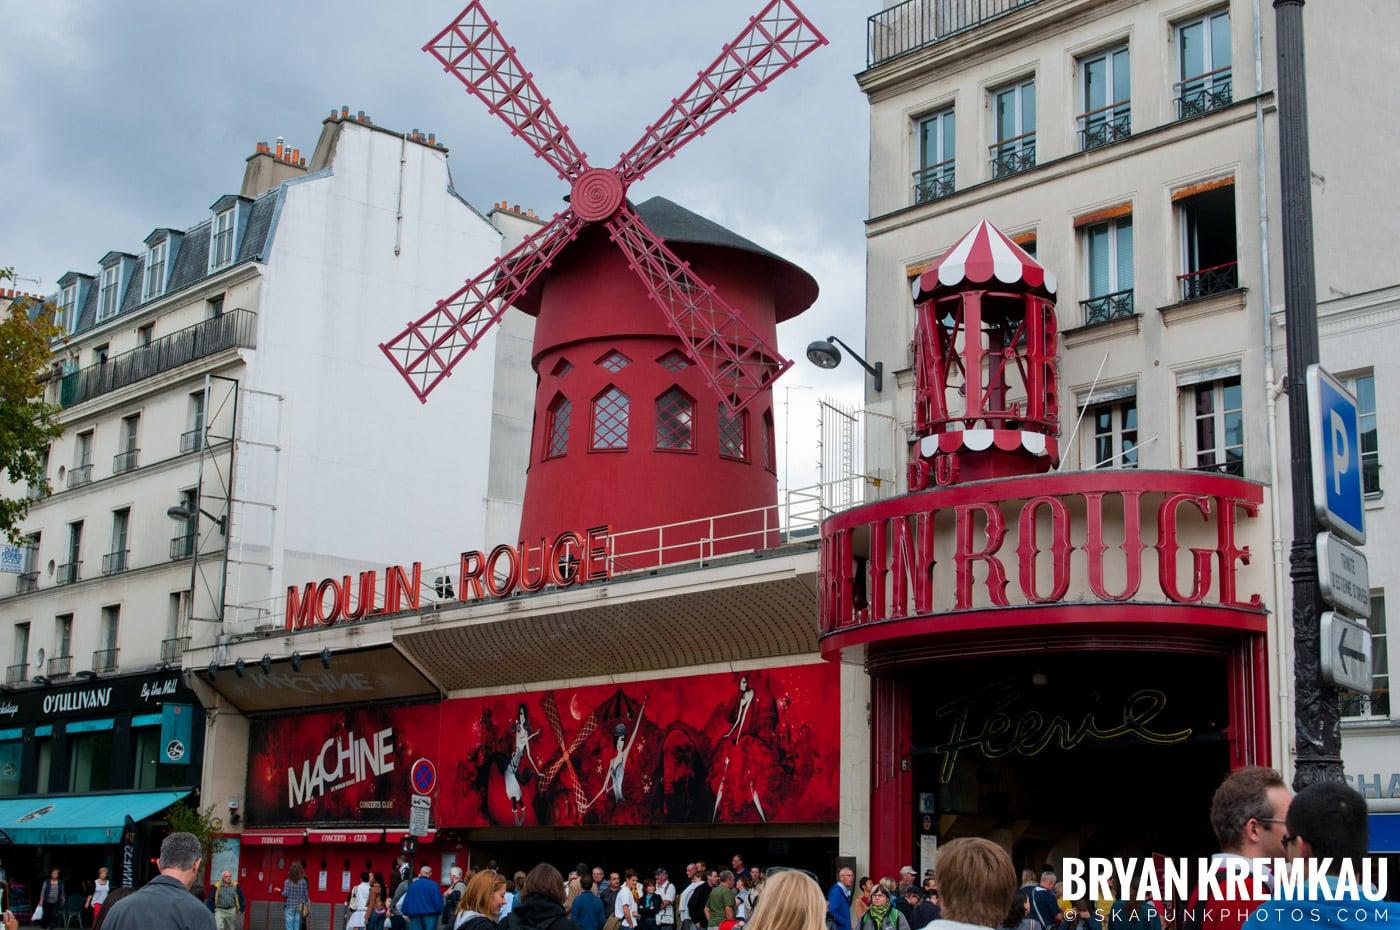 Paris, France Honeymoon - Day 6 - 7.23.11 (4)